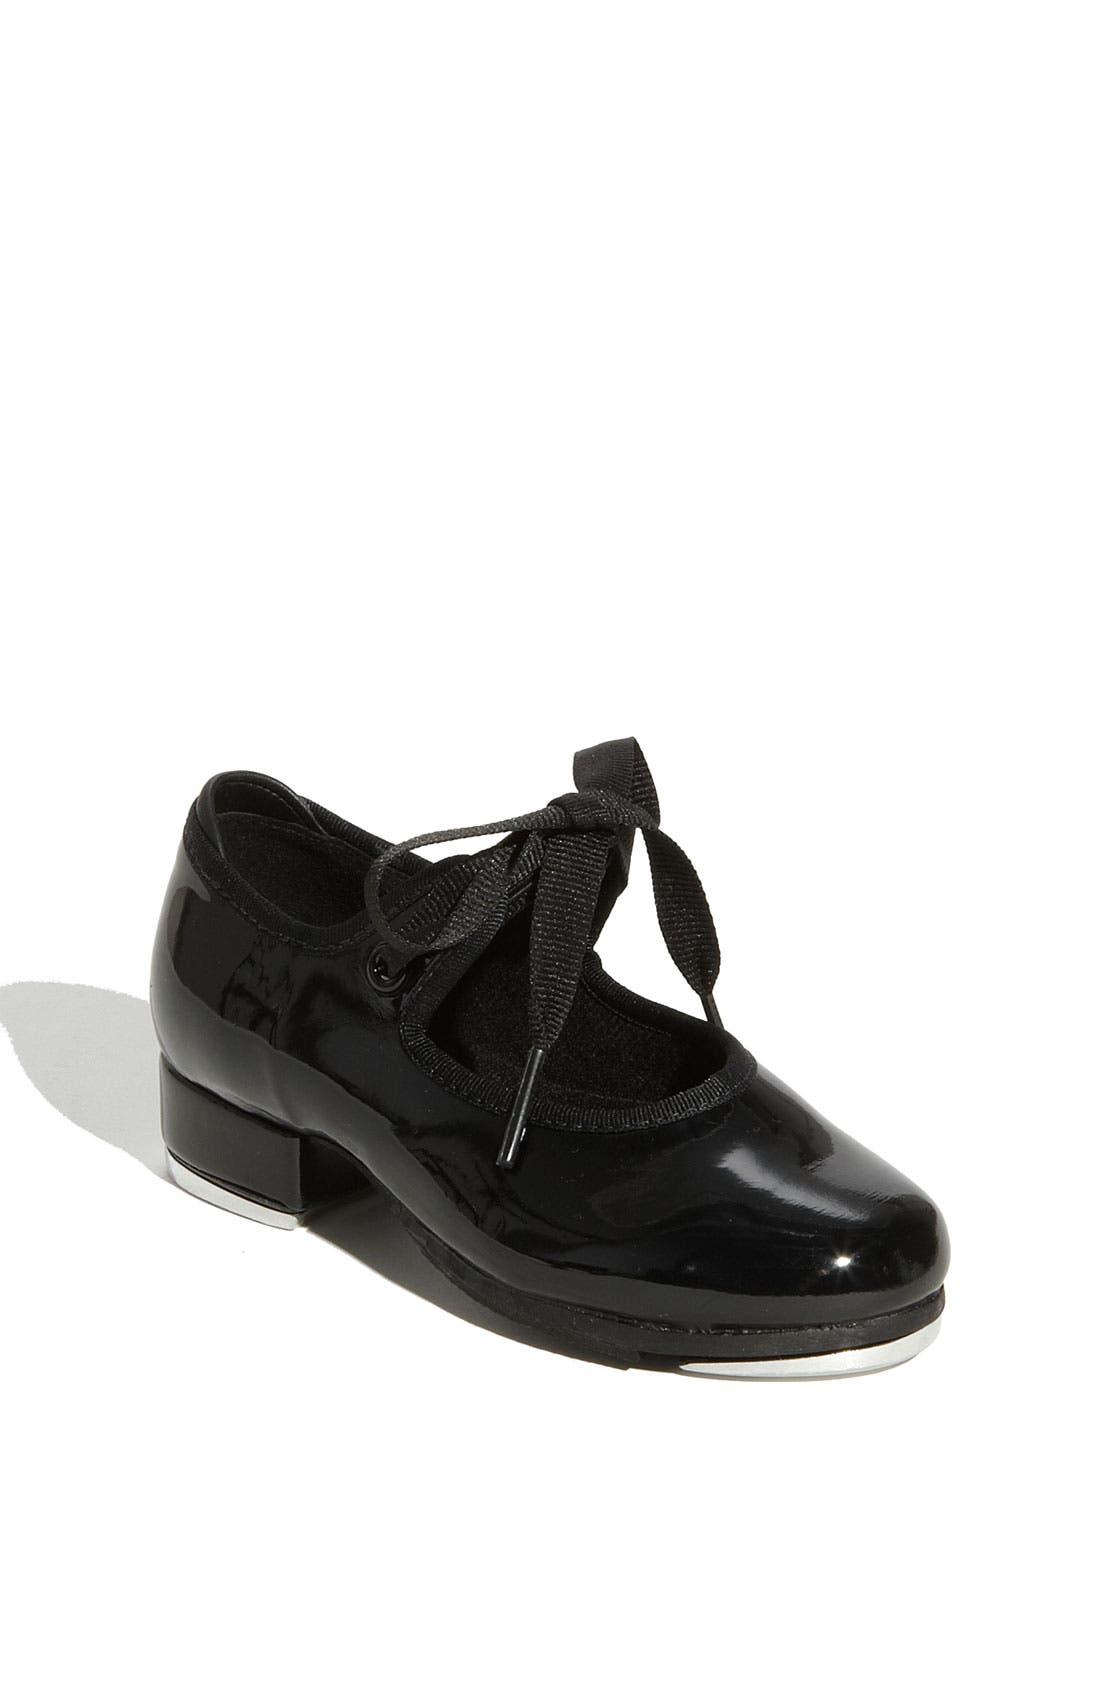 Alternate Image 1 Selected - Bloch 'Annie' Tap Shoe (Walker, Toddler & Little Kid)